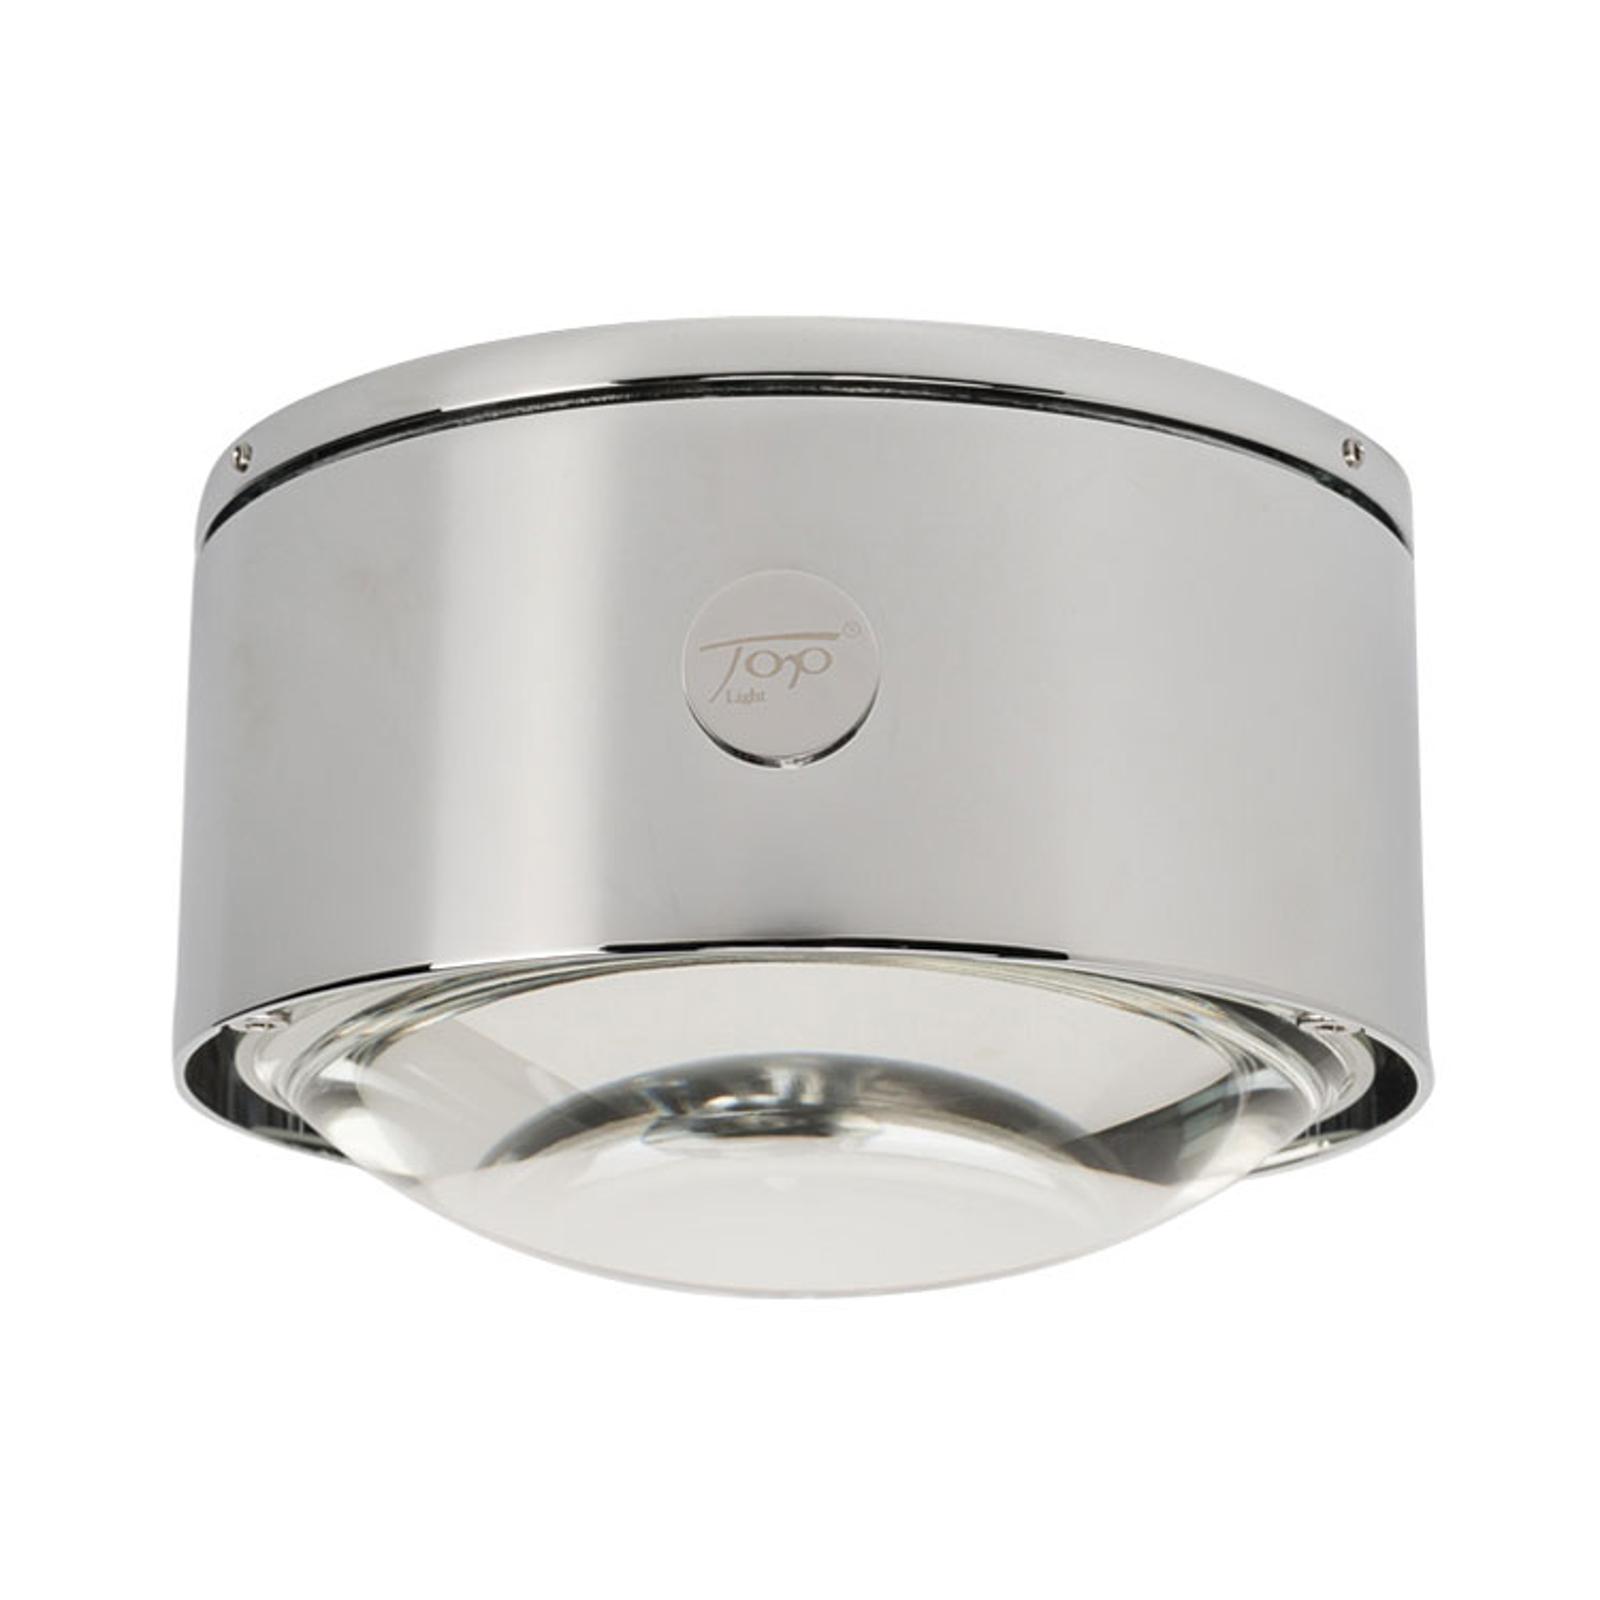 LED plafondlamp Puk Maxx One 2, mat chroom